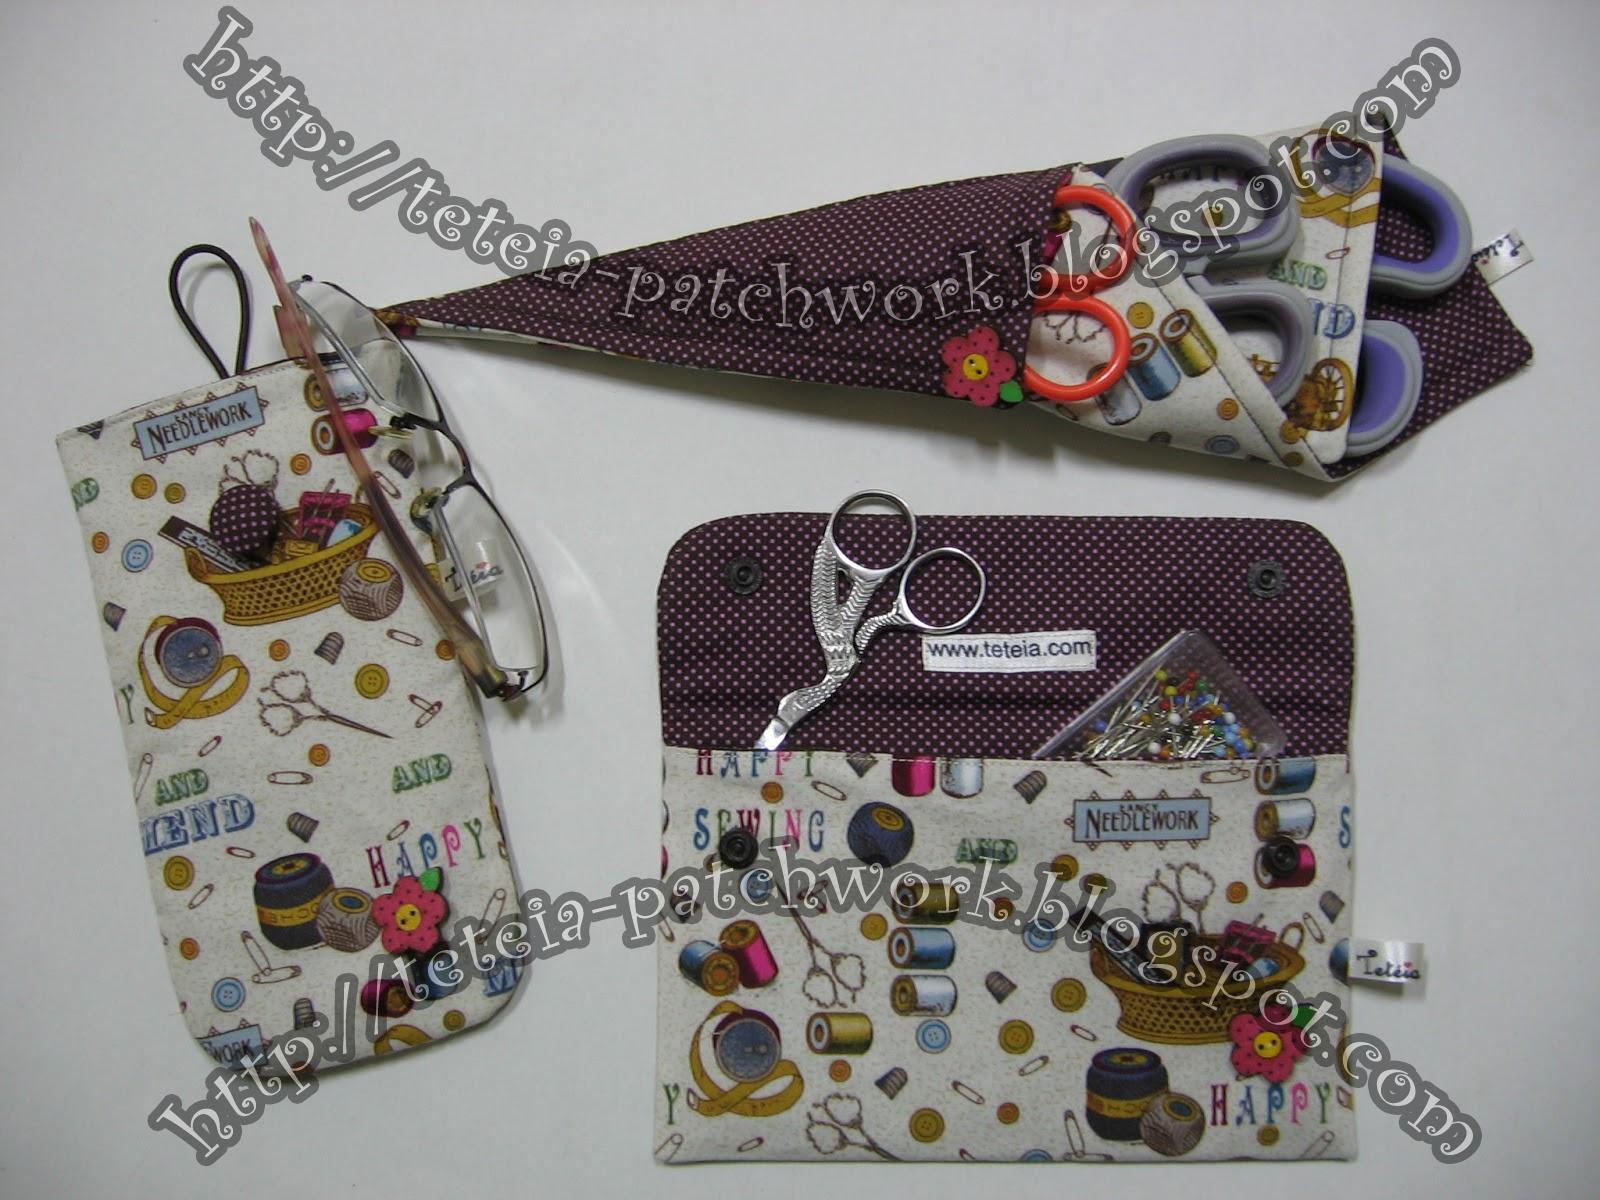 Tetéia Patchwork: Kit para ateliê de costura estampa costura/poá  #654132 1600x1200